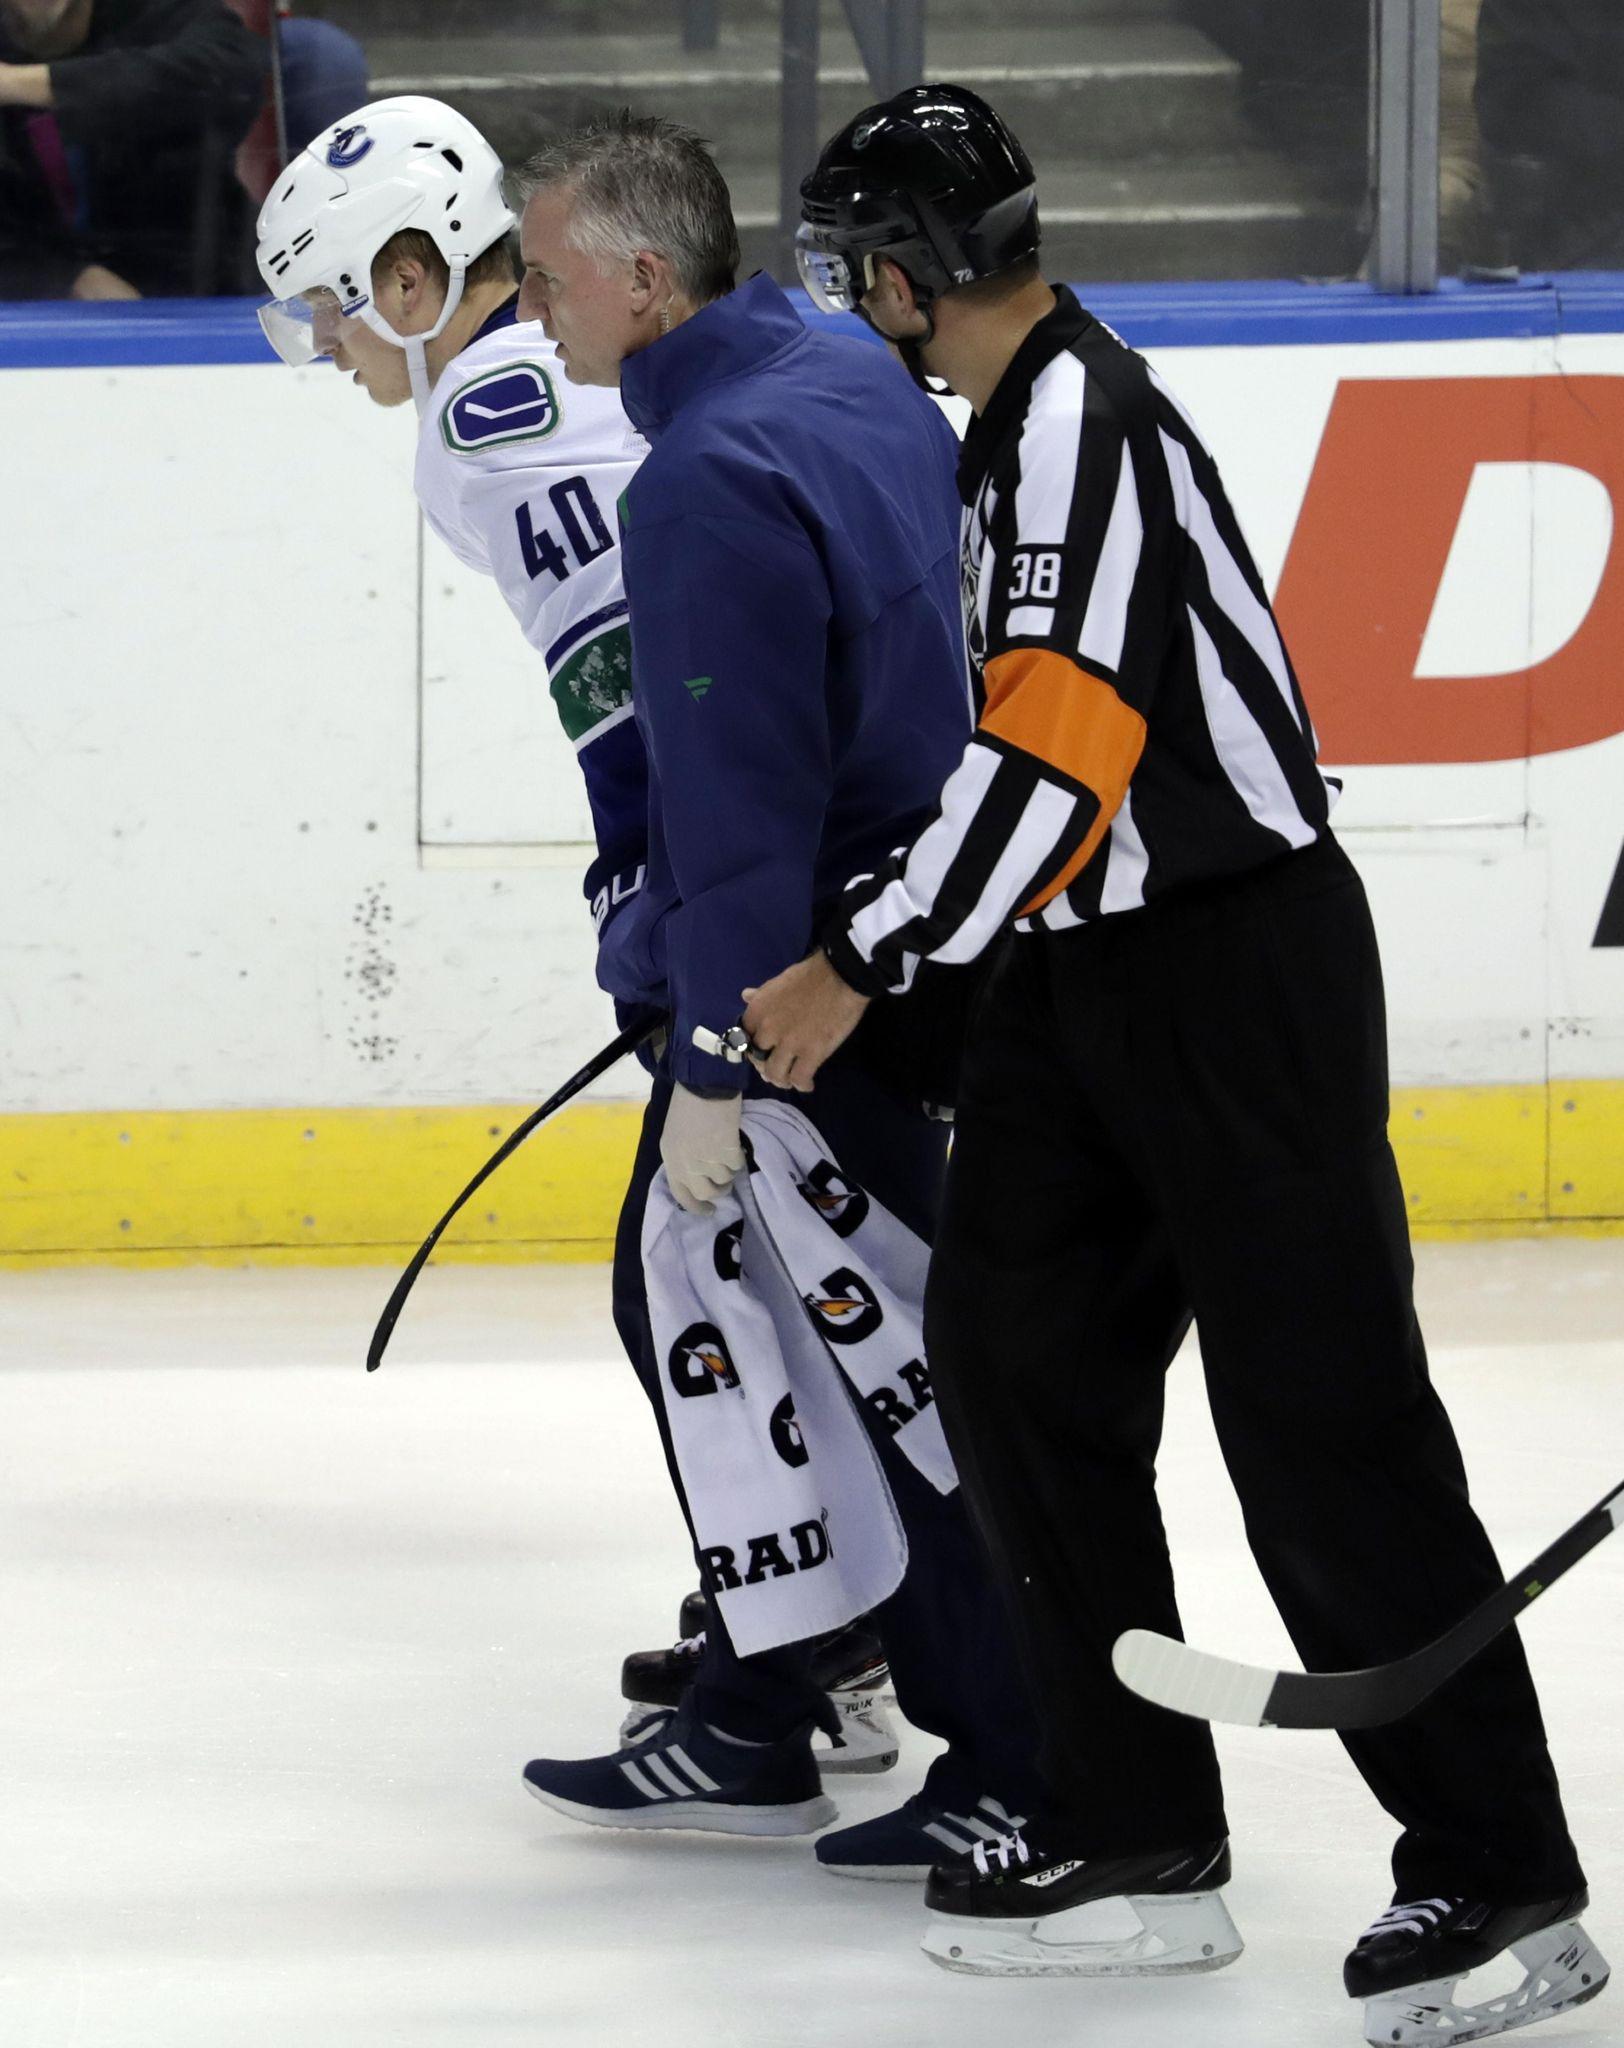 Canucks_injuries__hockey_80130_s1624x2048